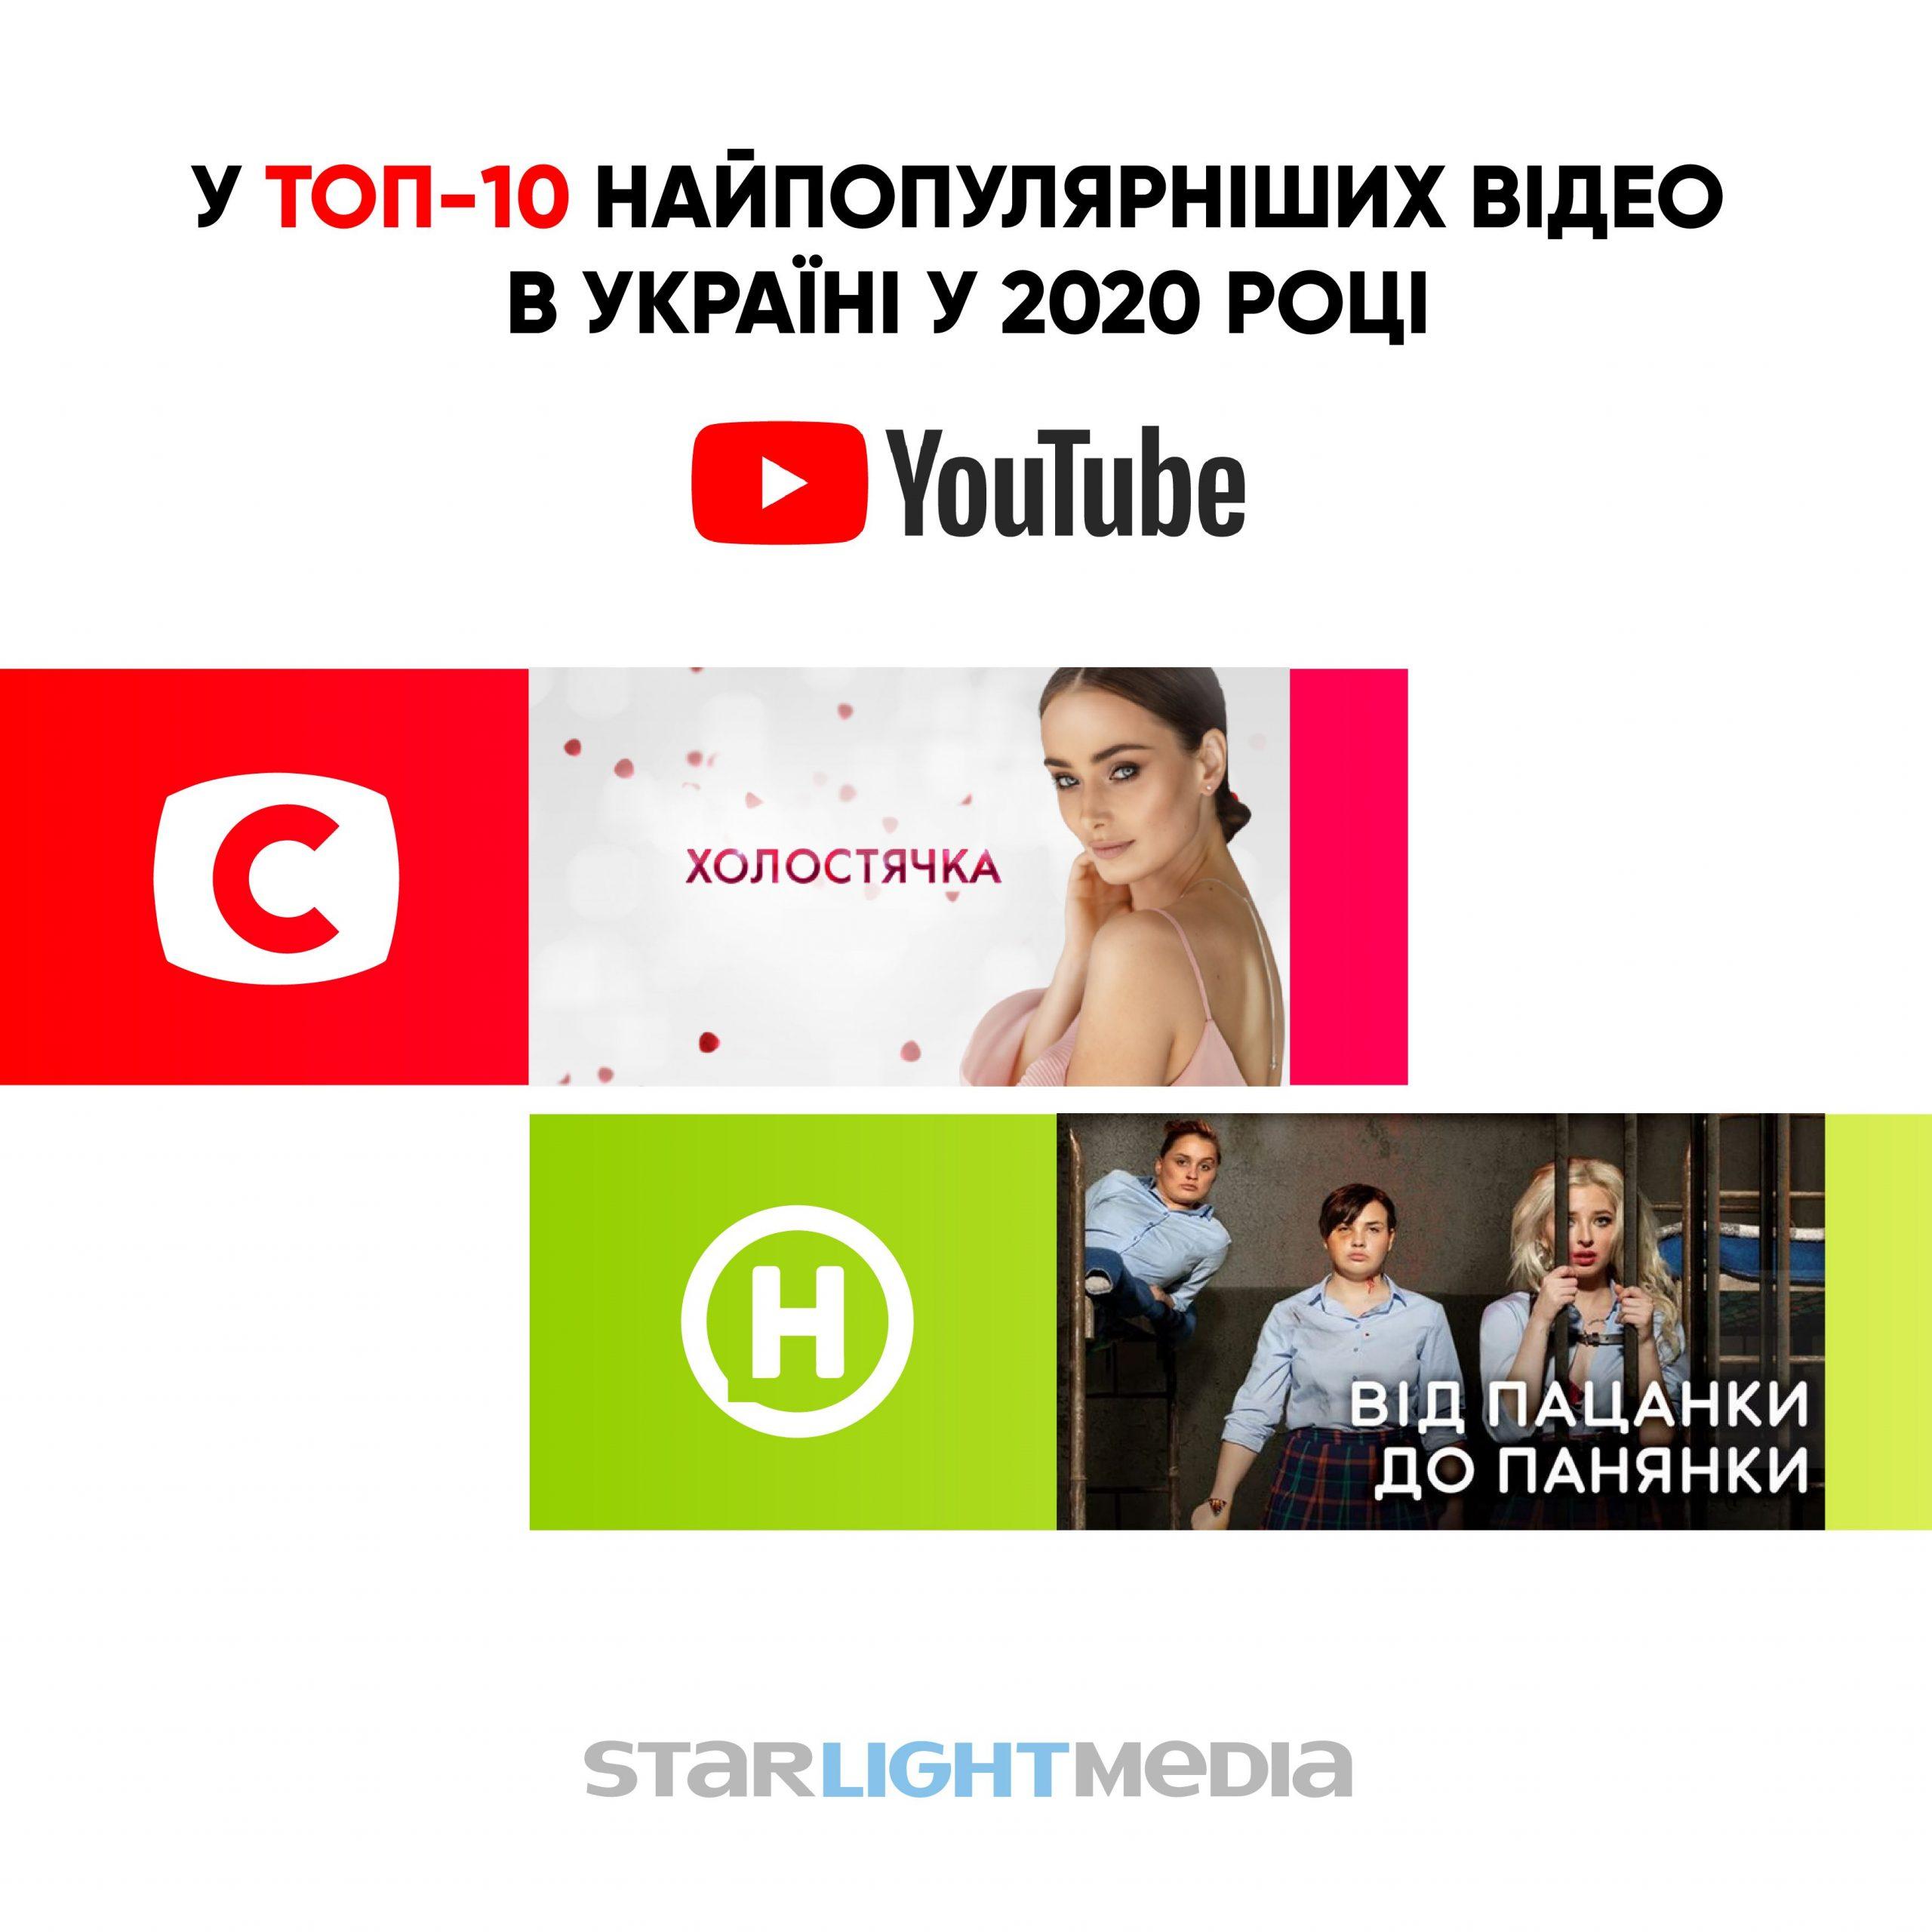 StarLightMedia Youtube